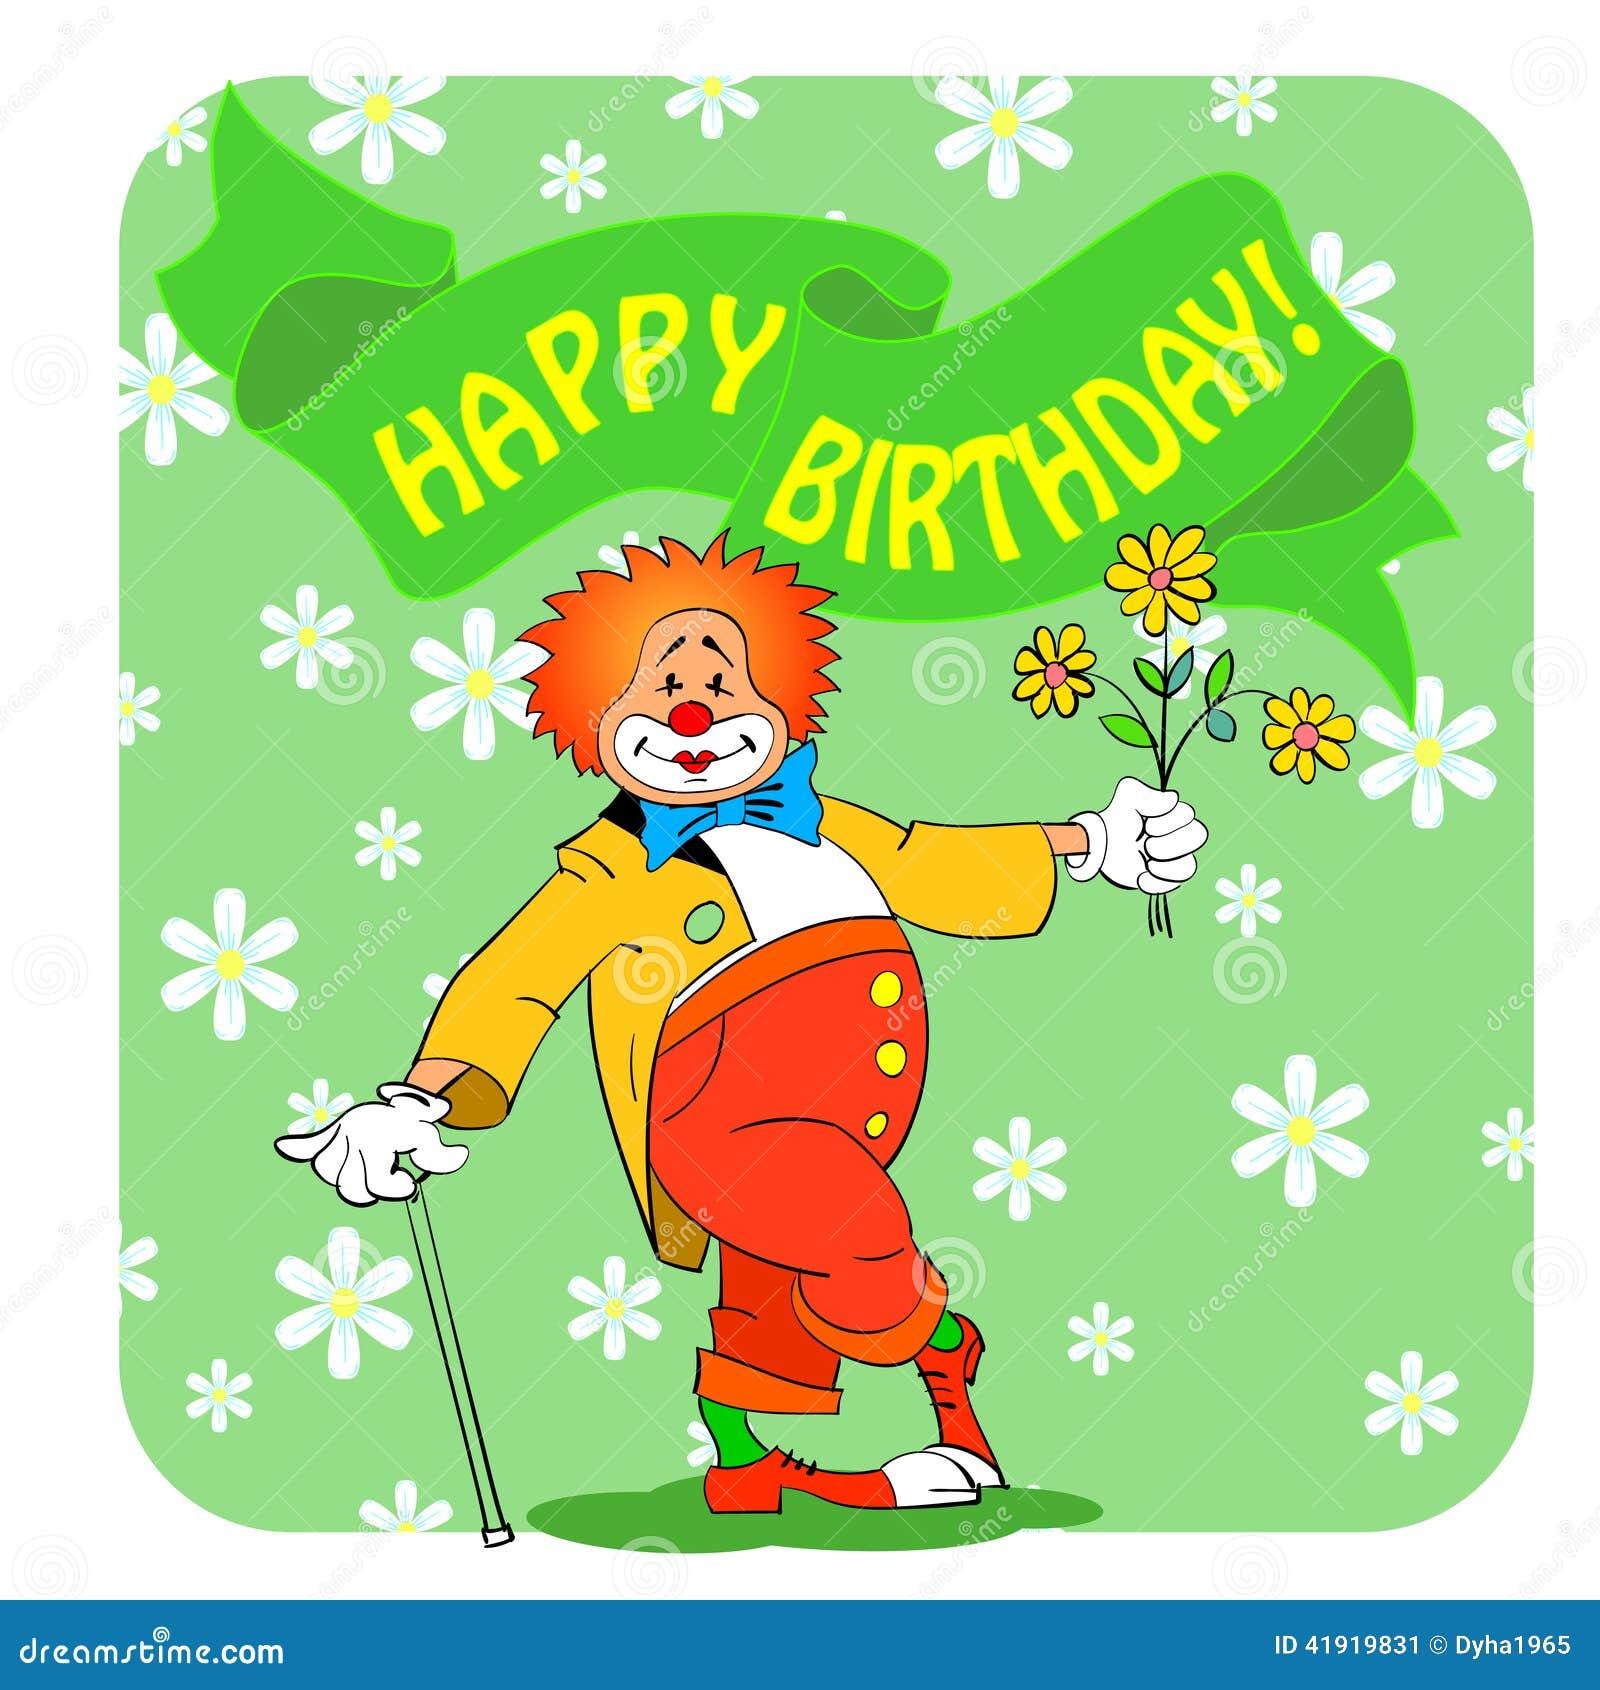 Cumpleaños clown03